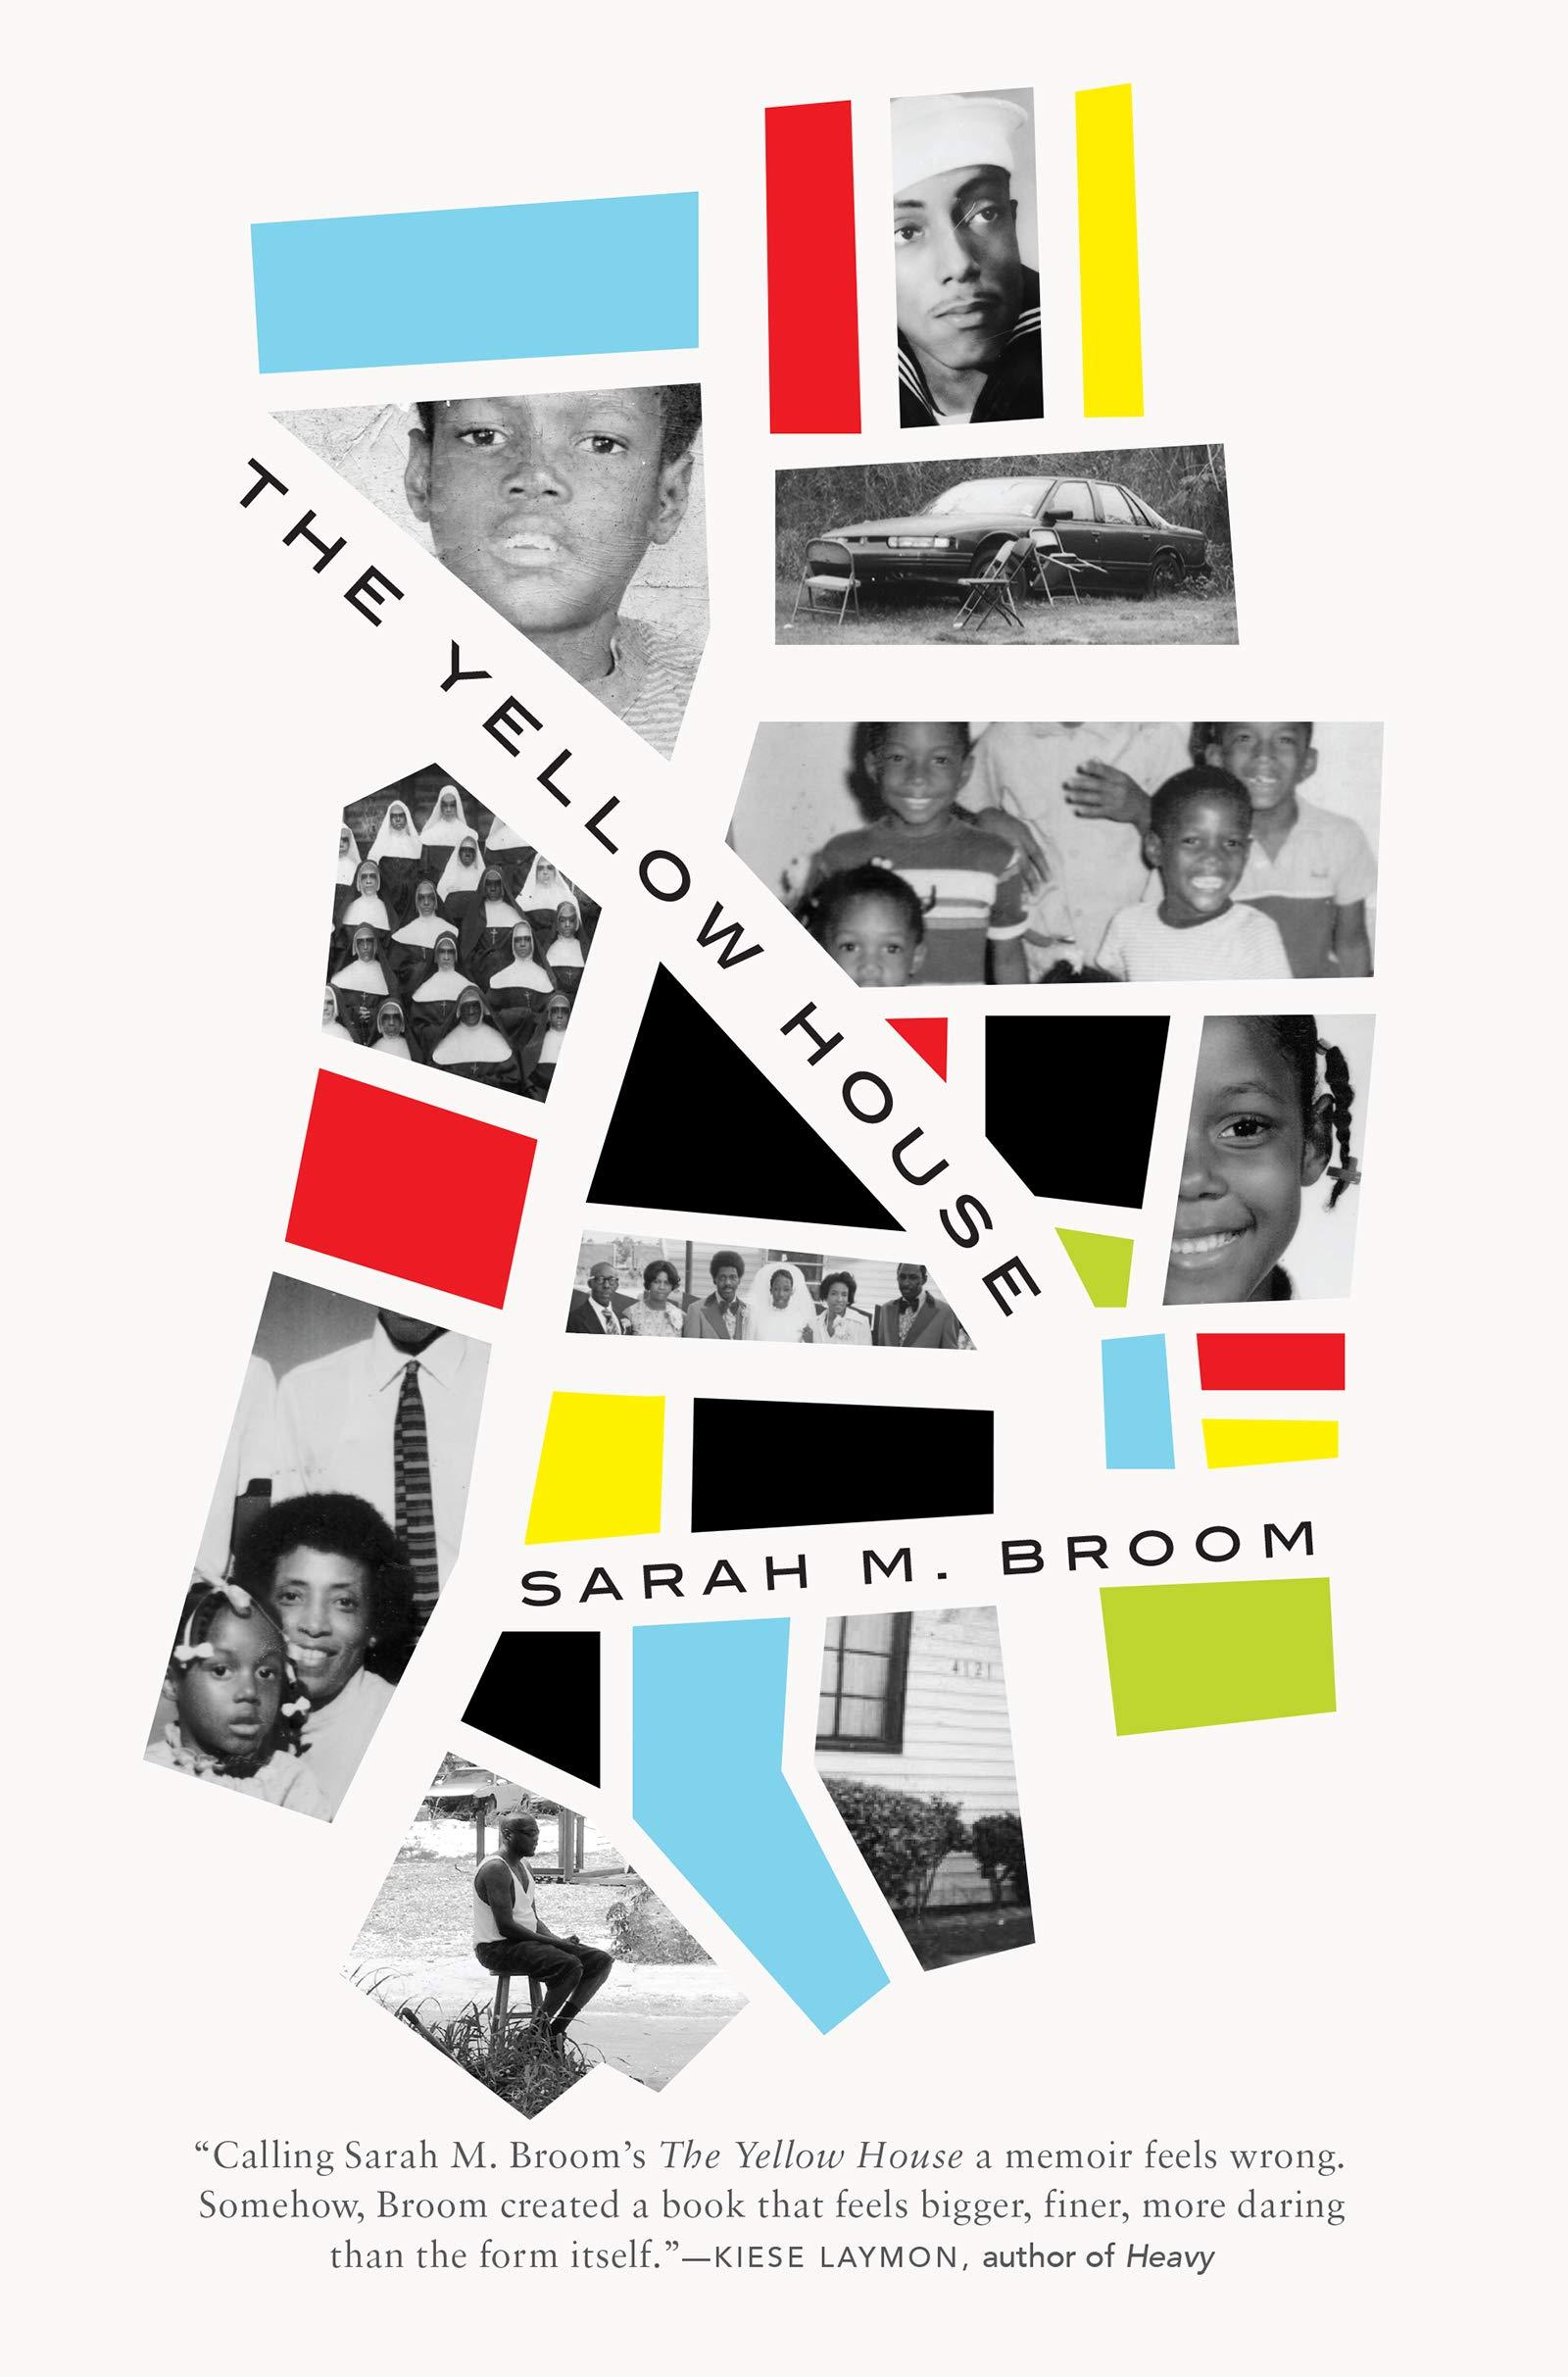 The Yellow House: A Memoir by Grove Press